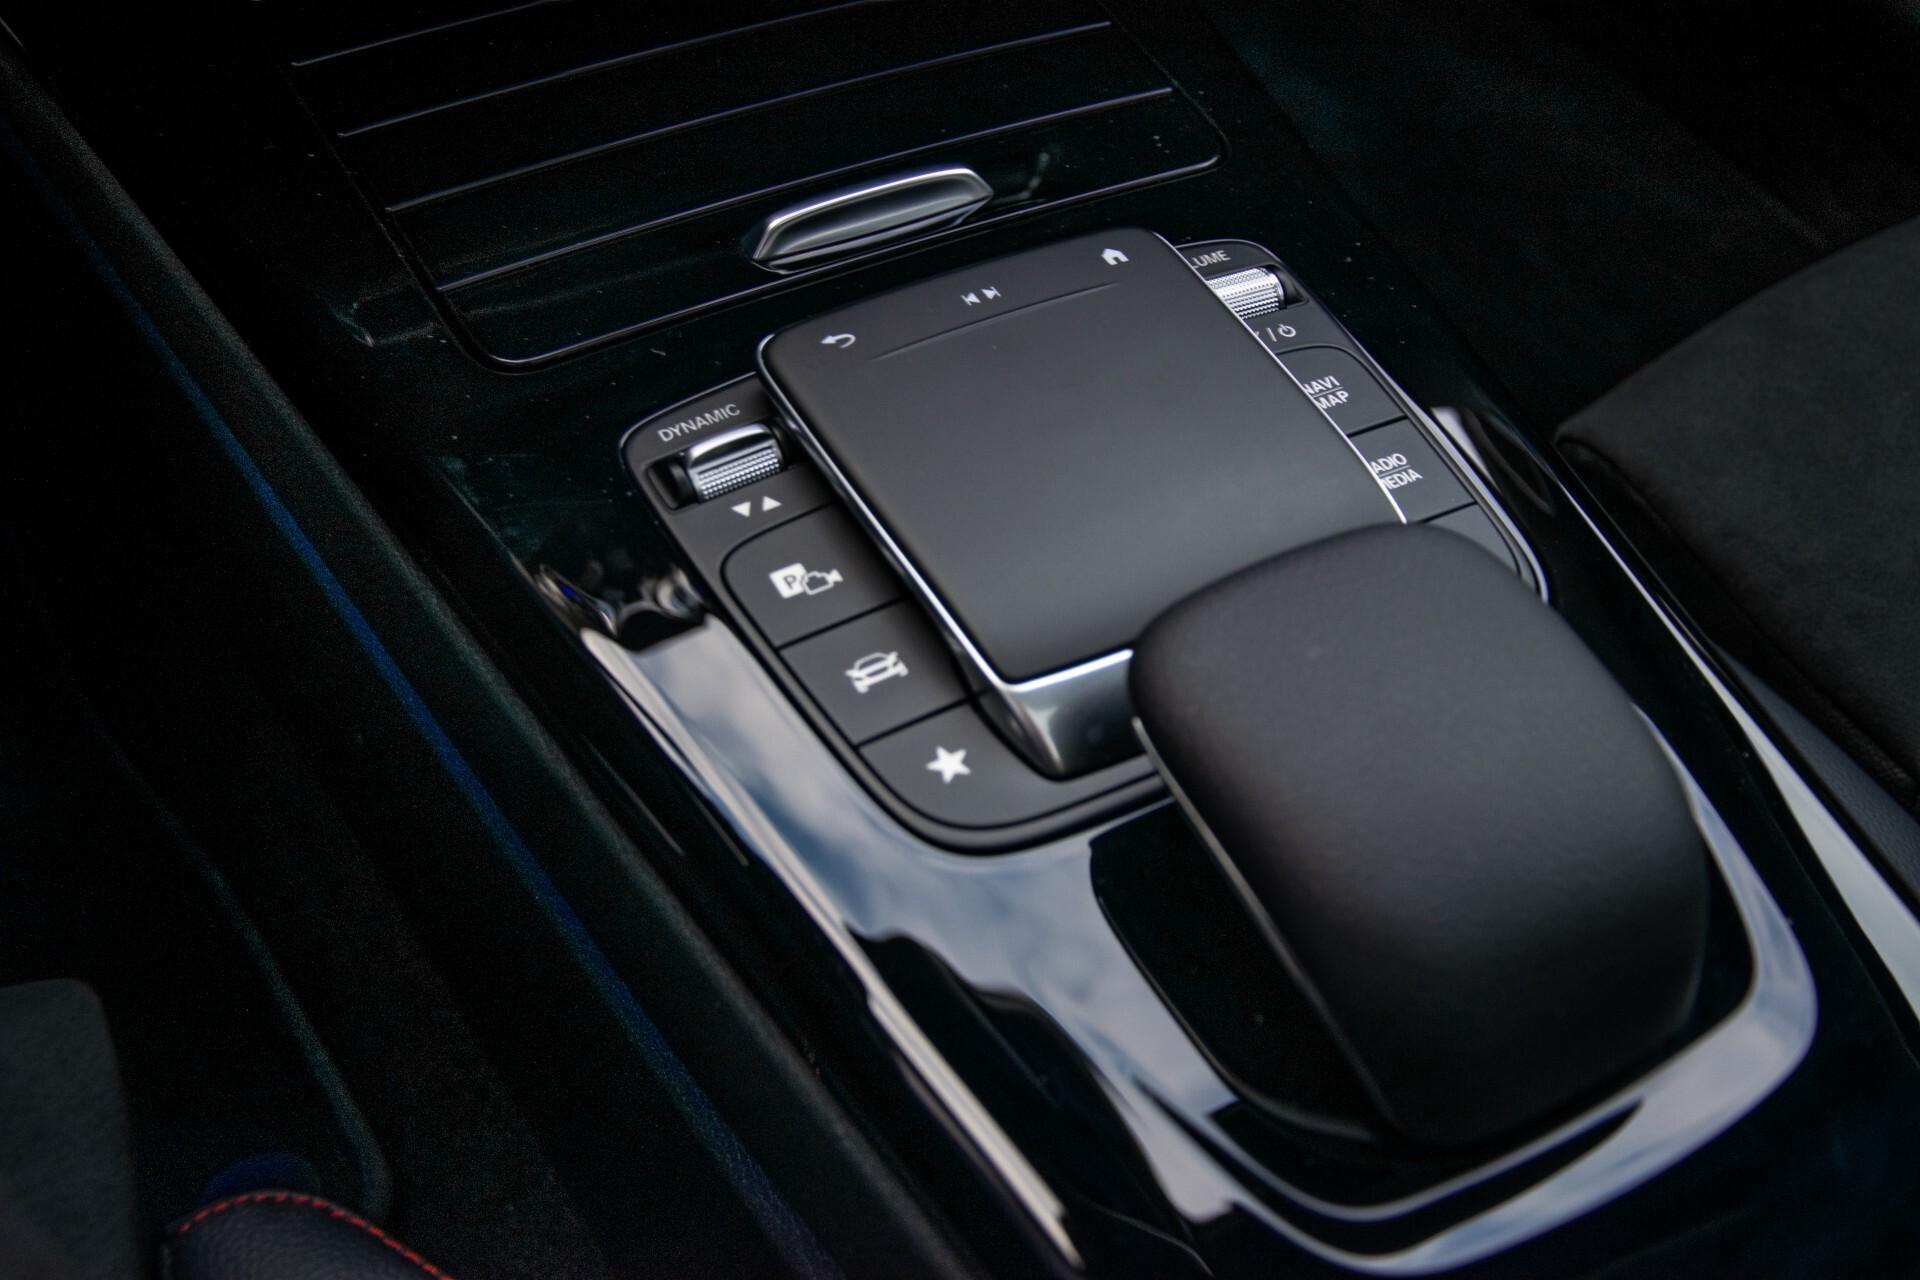 Mercedes-Benz A-Klasse 250 4-M AMG Panorama/Keyless-Entry/MBUX/HUD/Burmester/360/Multibeam LED Aut7 Foto 22